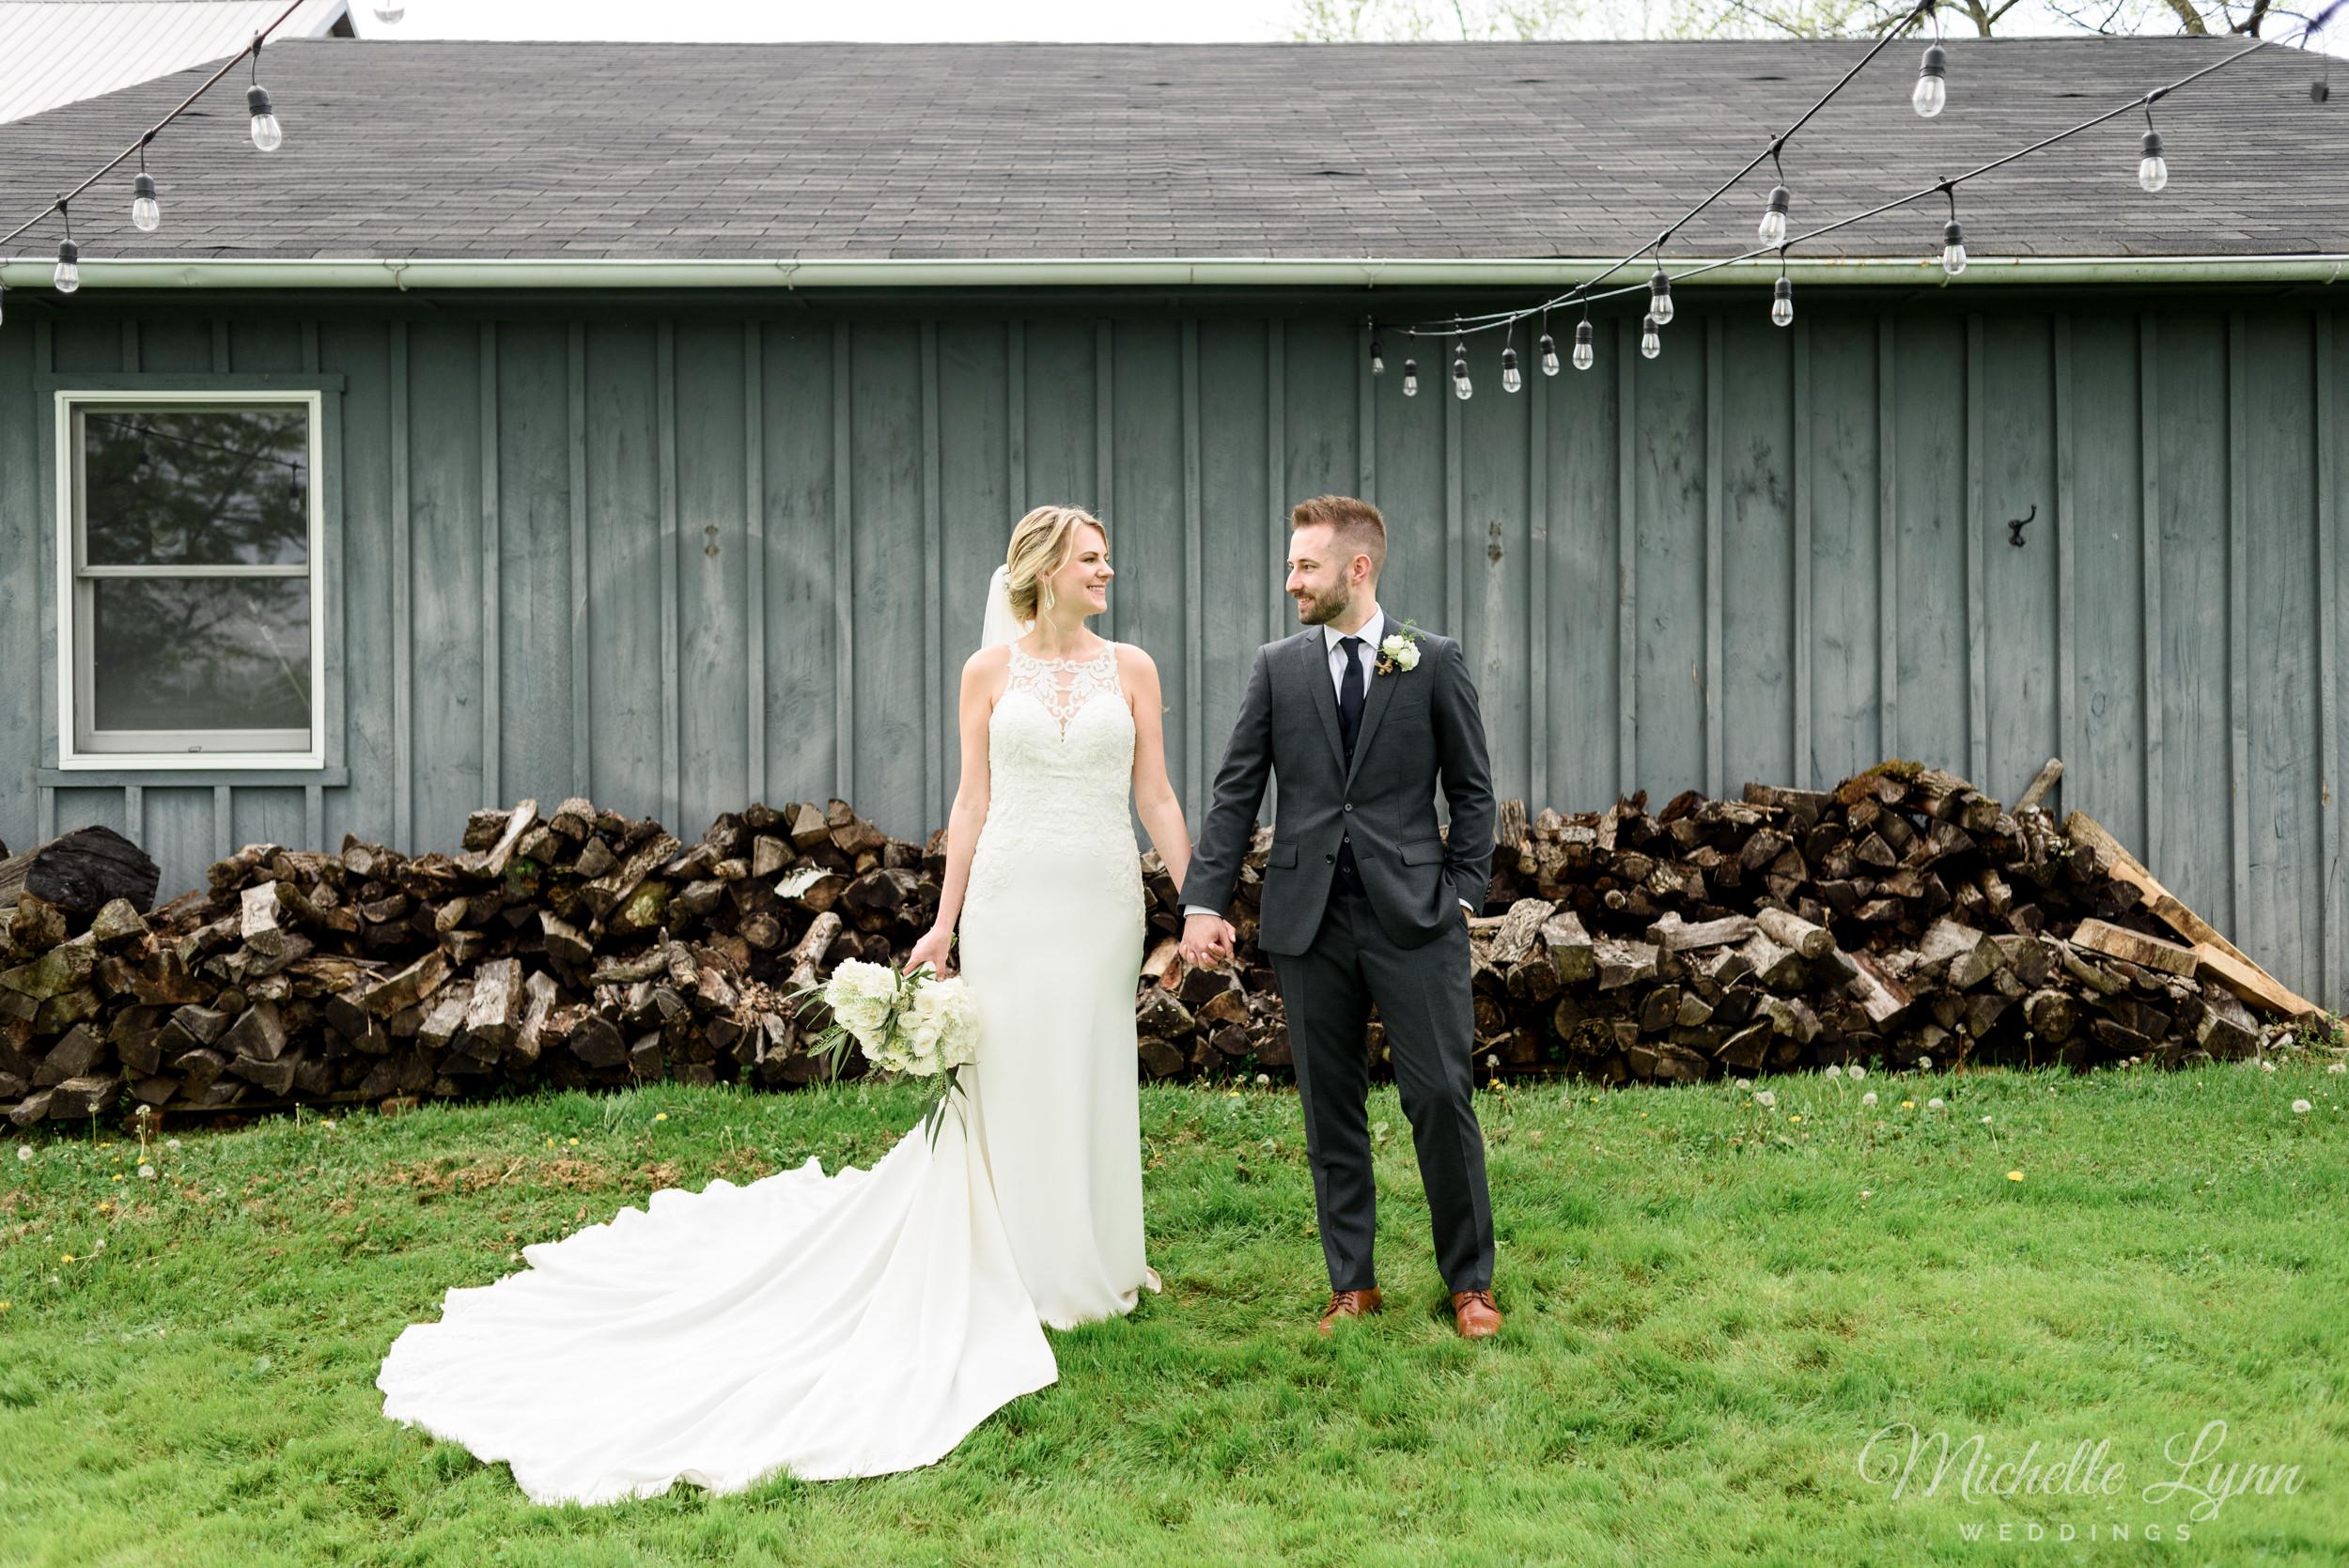 mlw-the-farm-bakery-and-events-wedding-photos-50.jpg